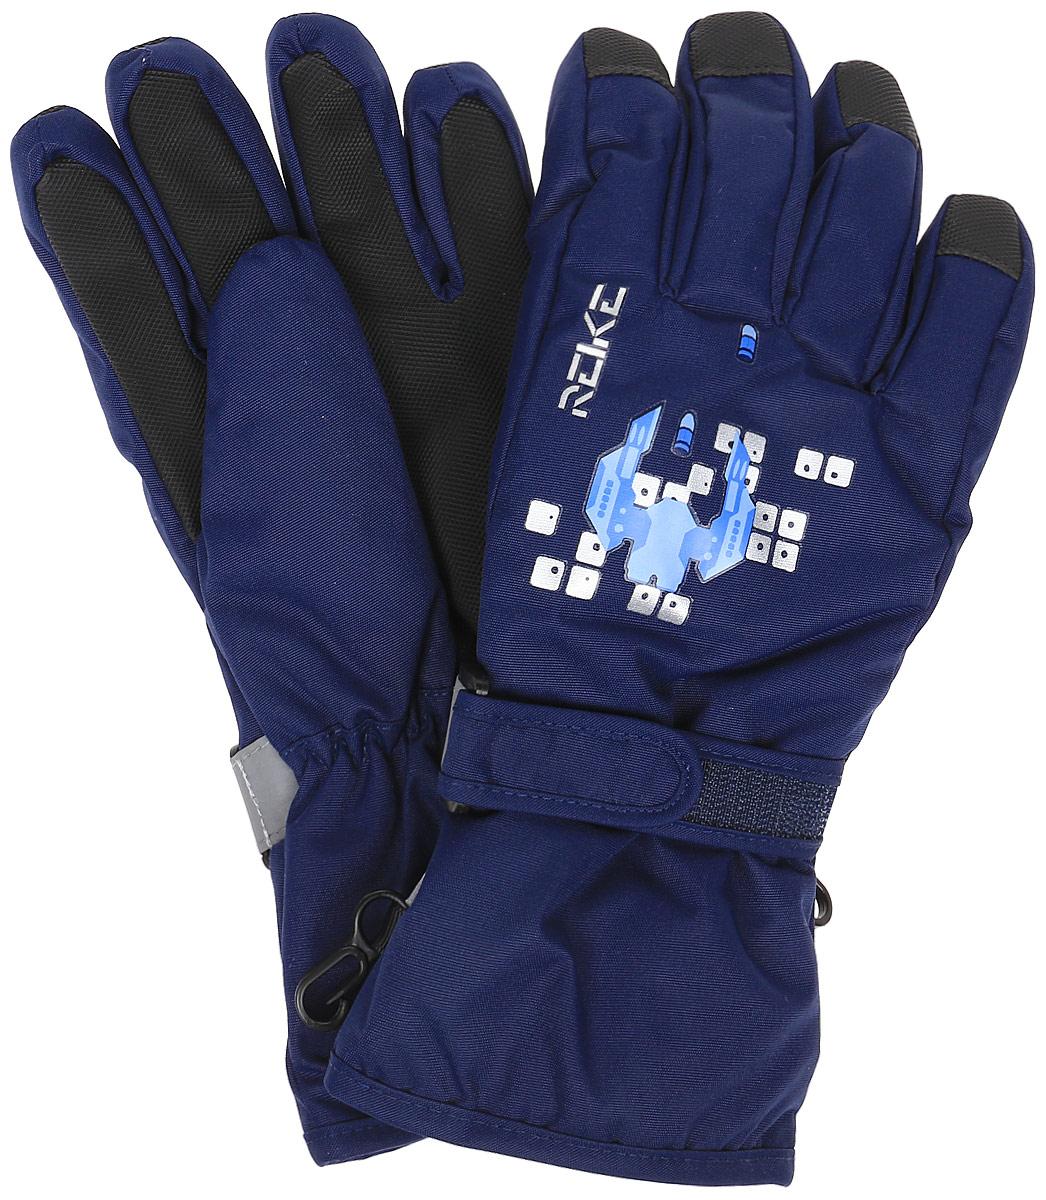 Перчатки для мальчика Reike Галактика, цвет: темно-синий. RW18_GLX navy. Размер 8 перчатки reike